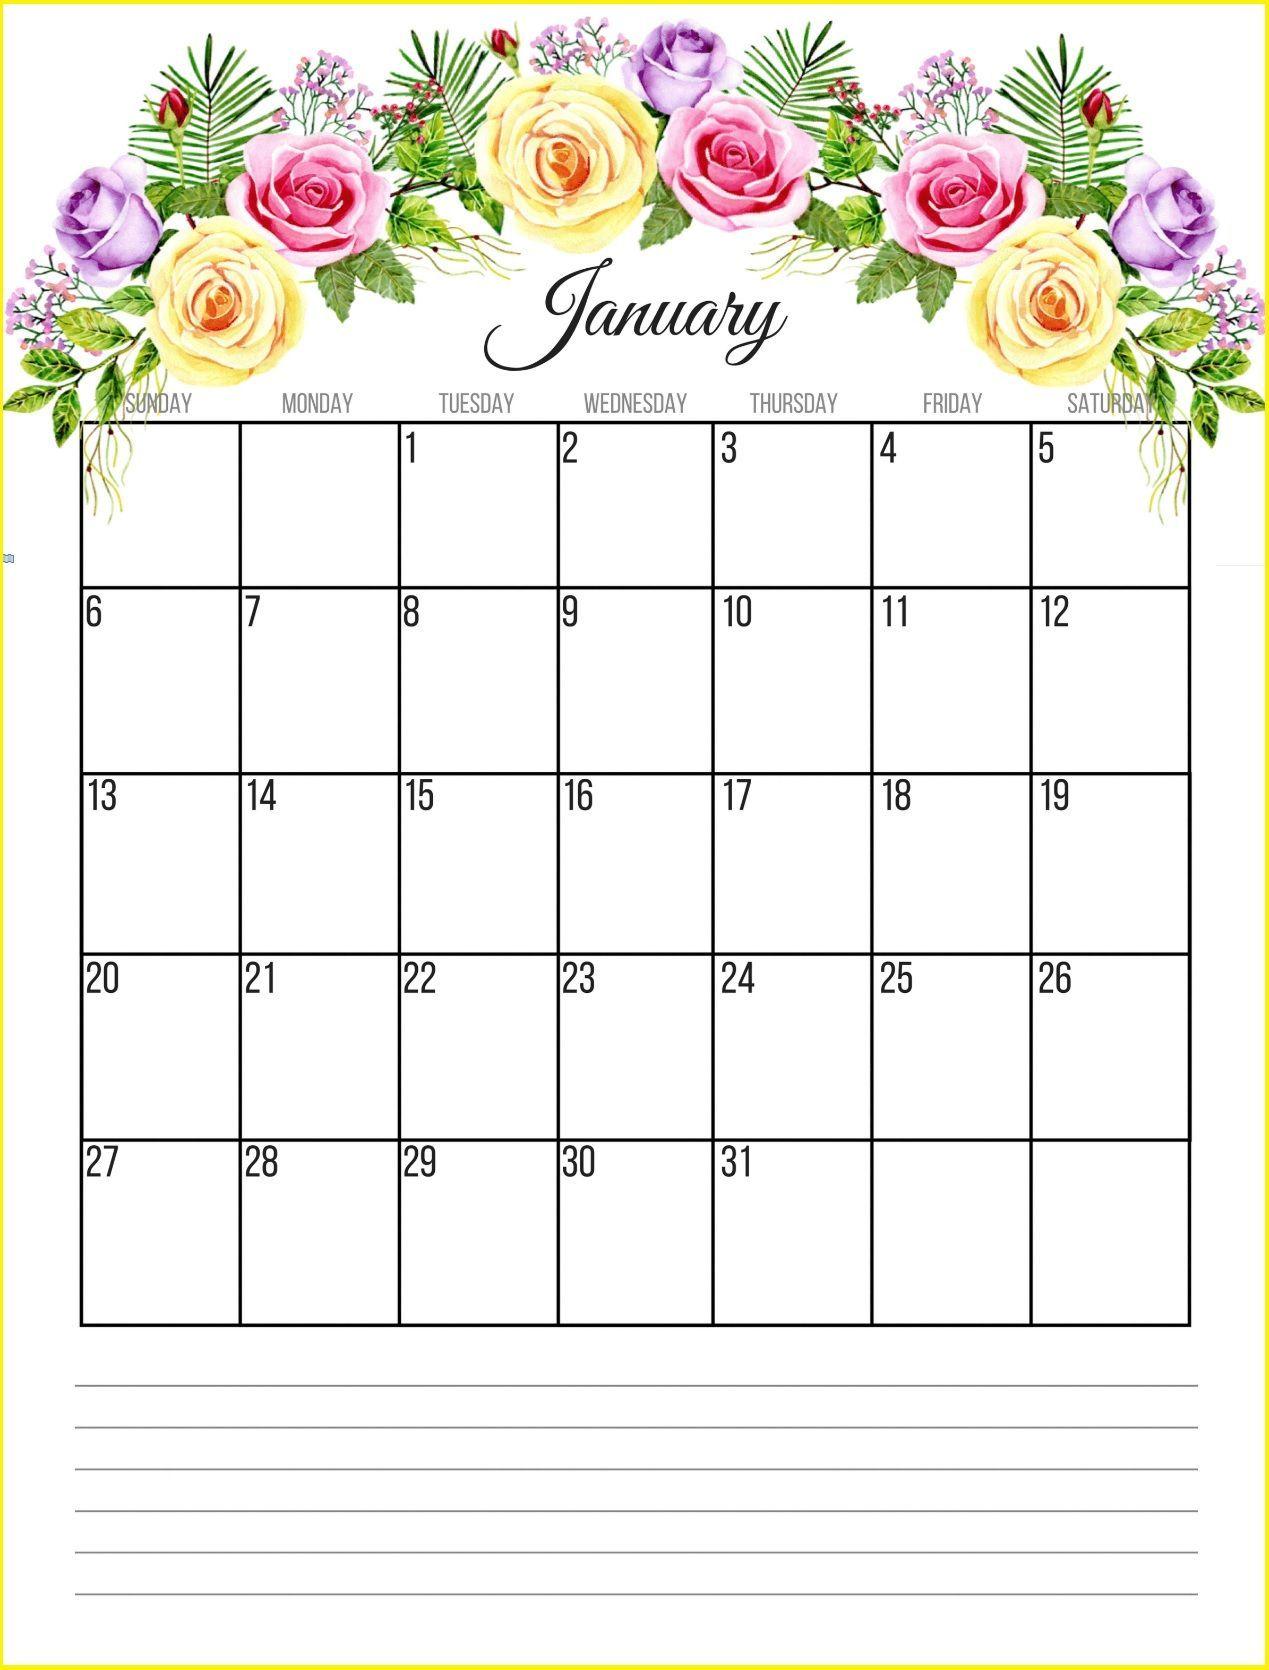 Floral January 2019 Desk Wall Calendar Calendar Printables